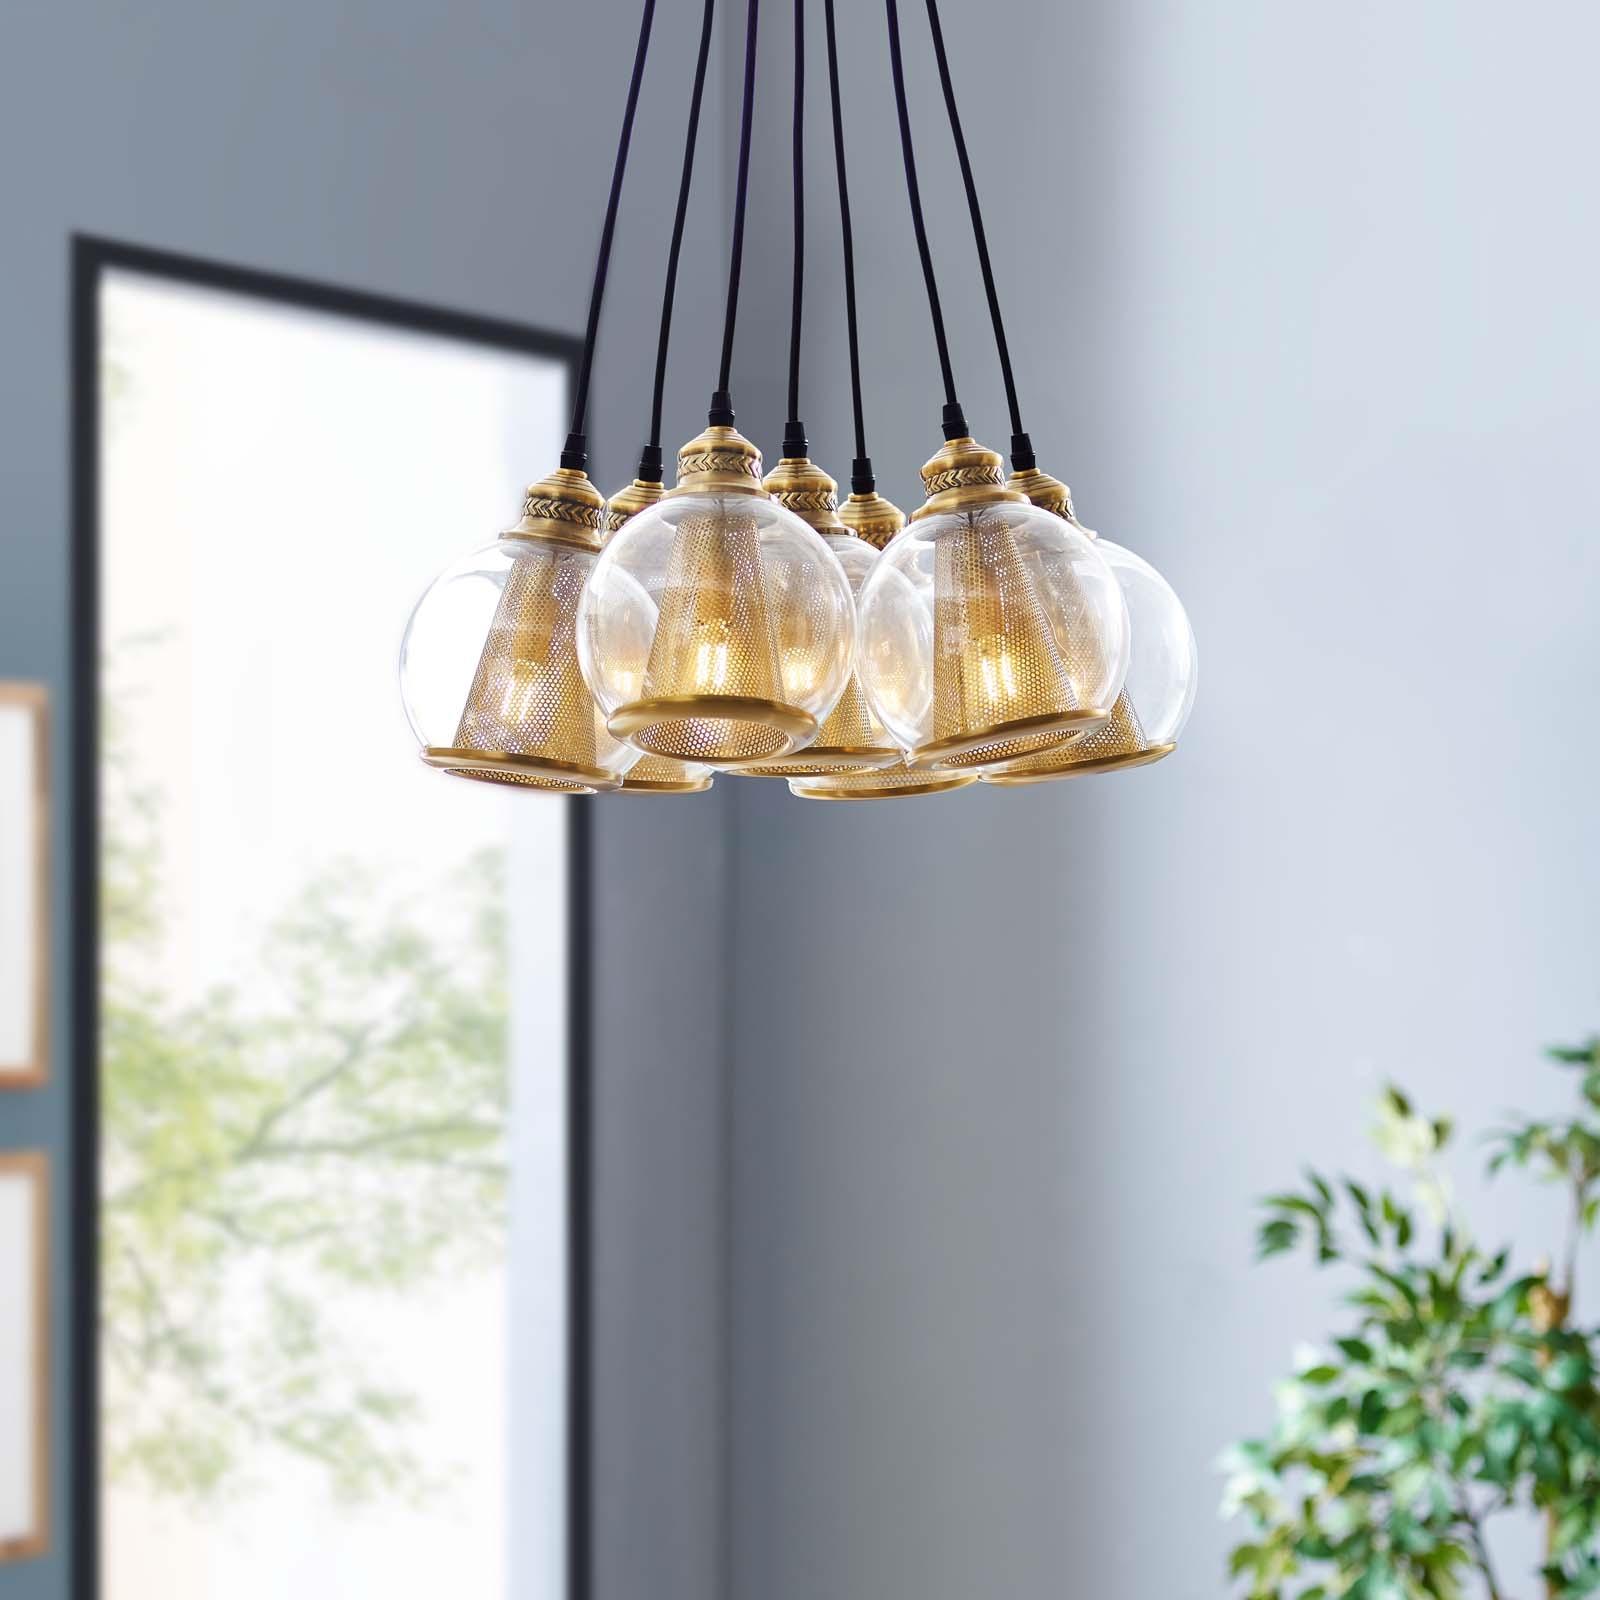 Peak Brass Cone and Glass Globe Cluster Pendant Chandelier